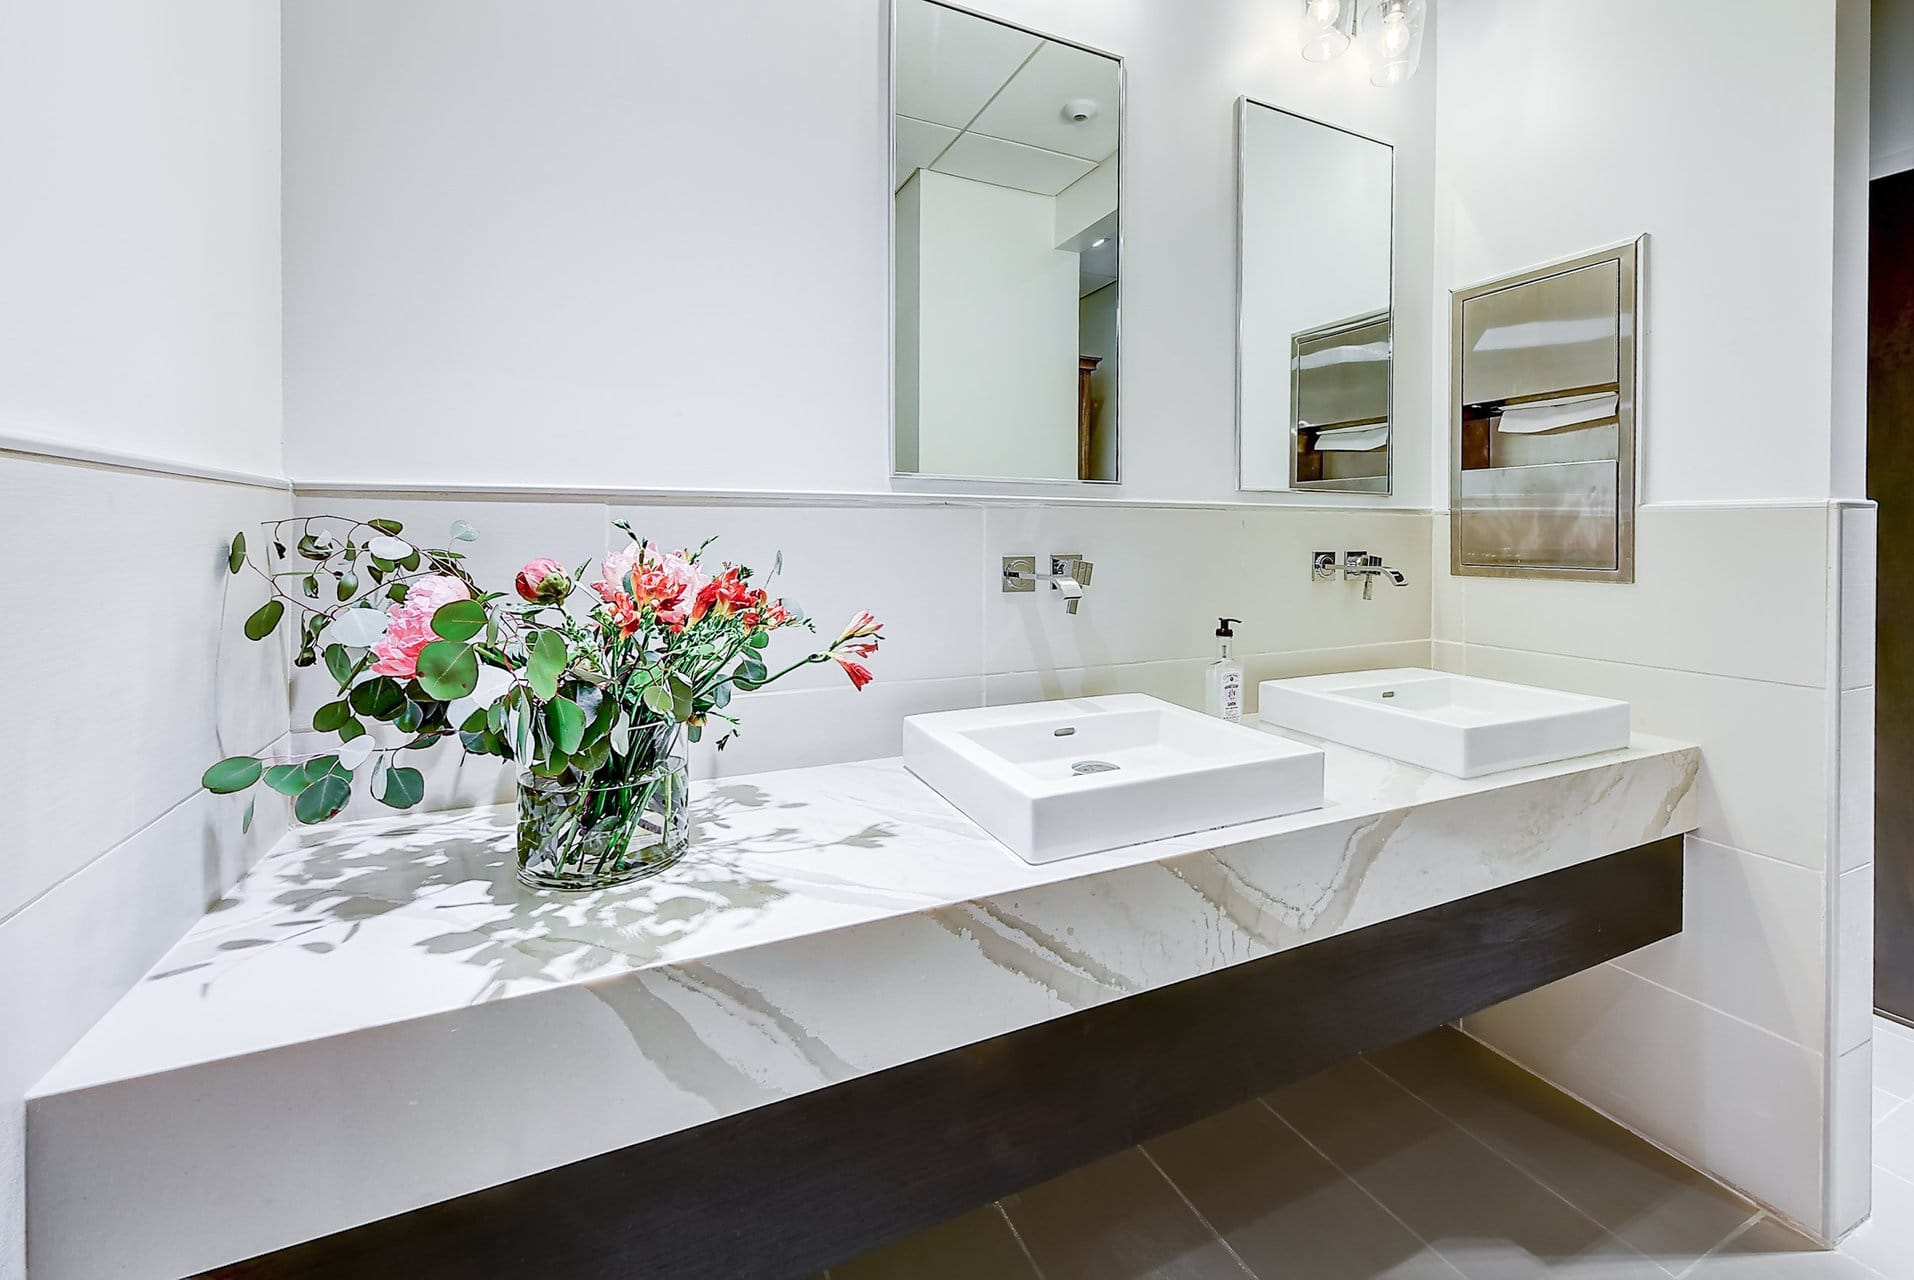 bathroom sink mirror flower